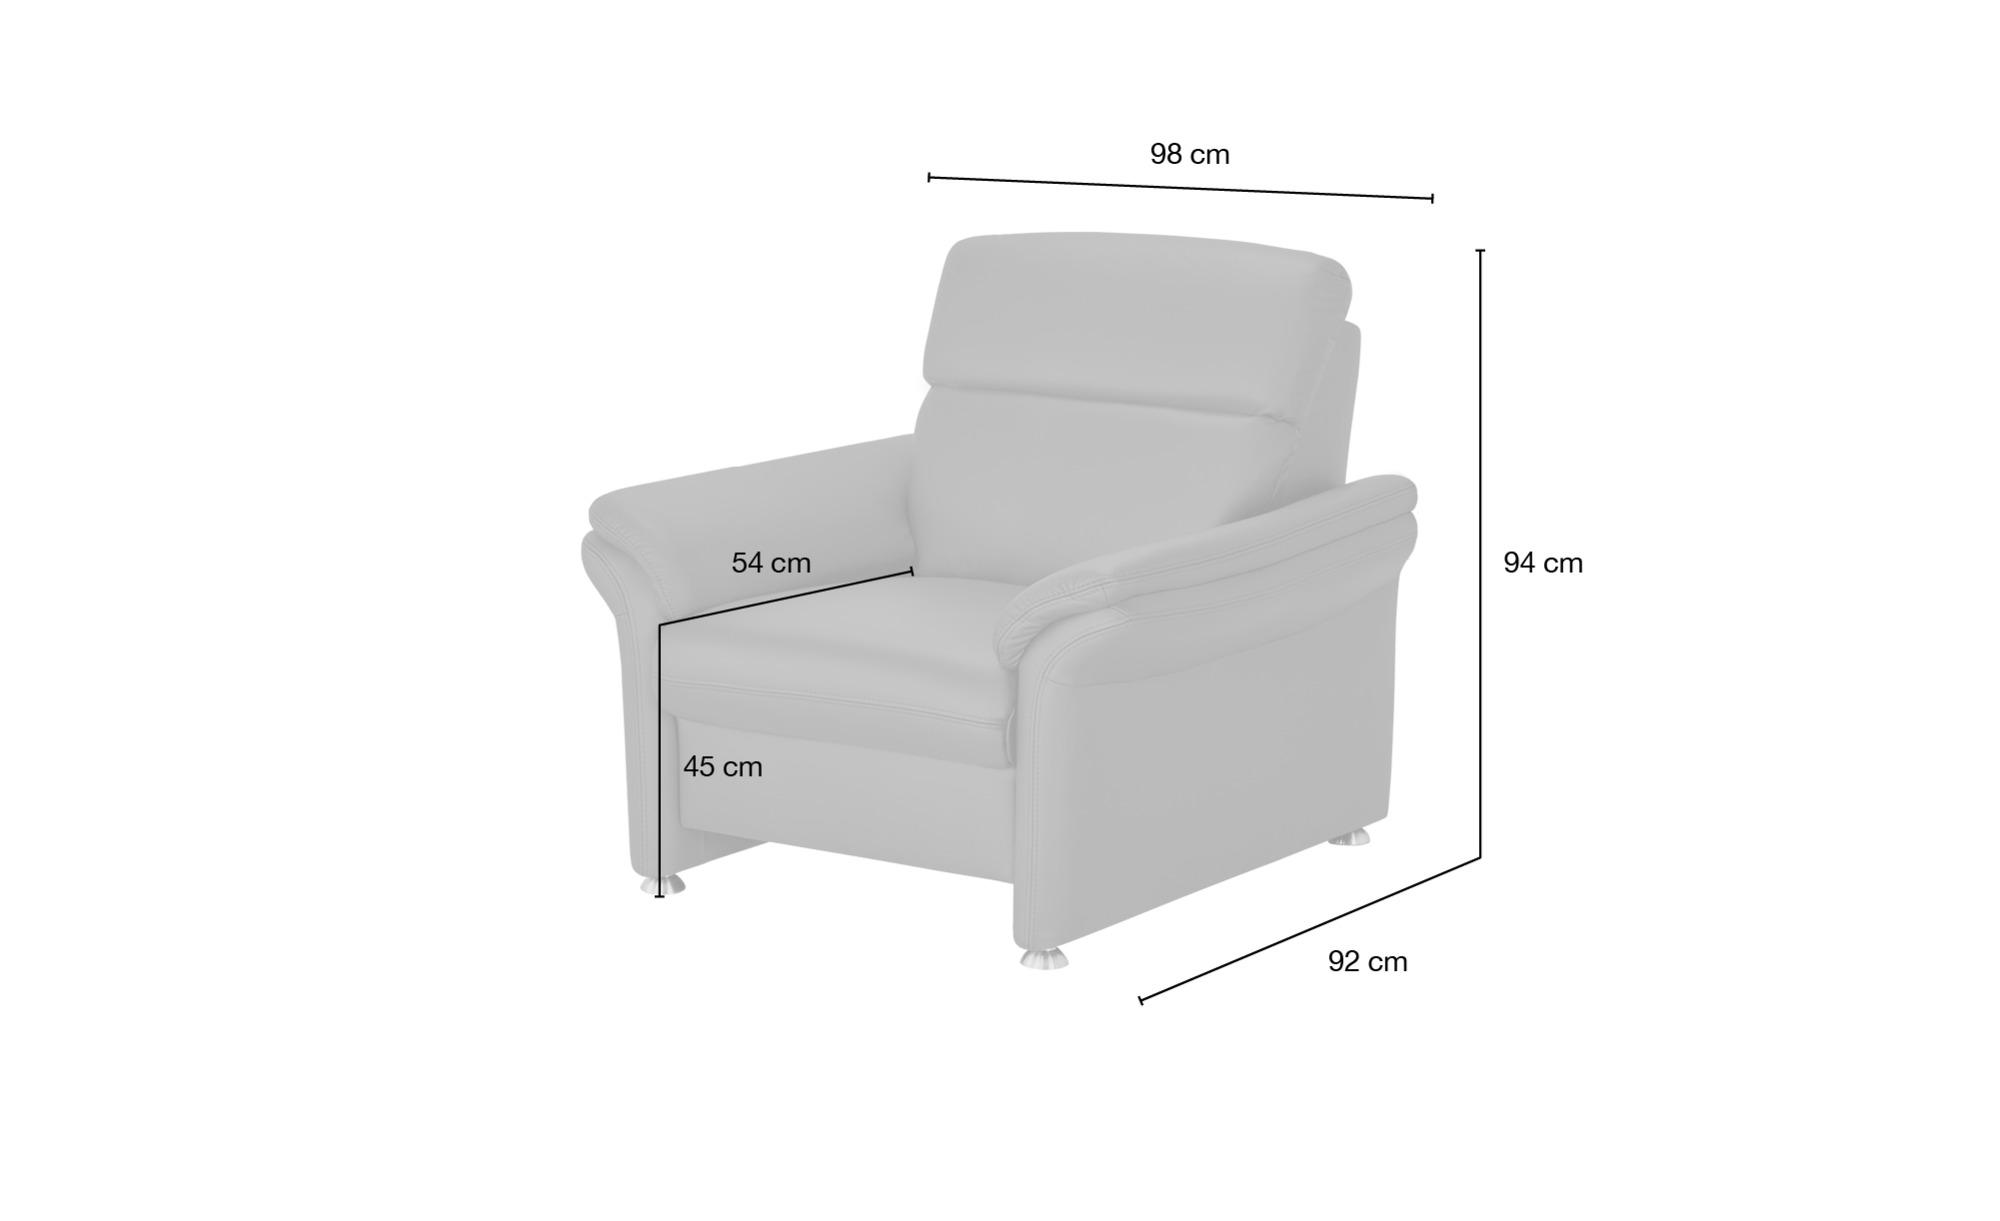 meinSofa Ledersessel orange - Leder Manon ¦ orange ¦ Maße (cm): B: 98 H: 94 T: 92 Polstermöbel > Sessel > Ledersessel - Höffner